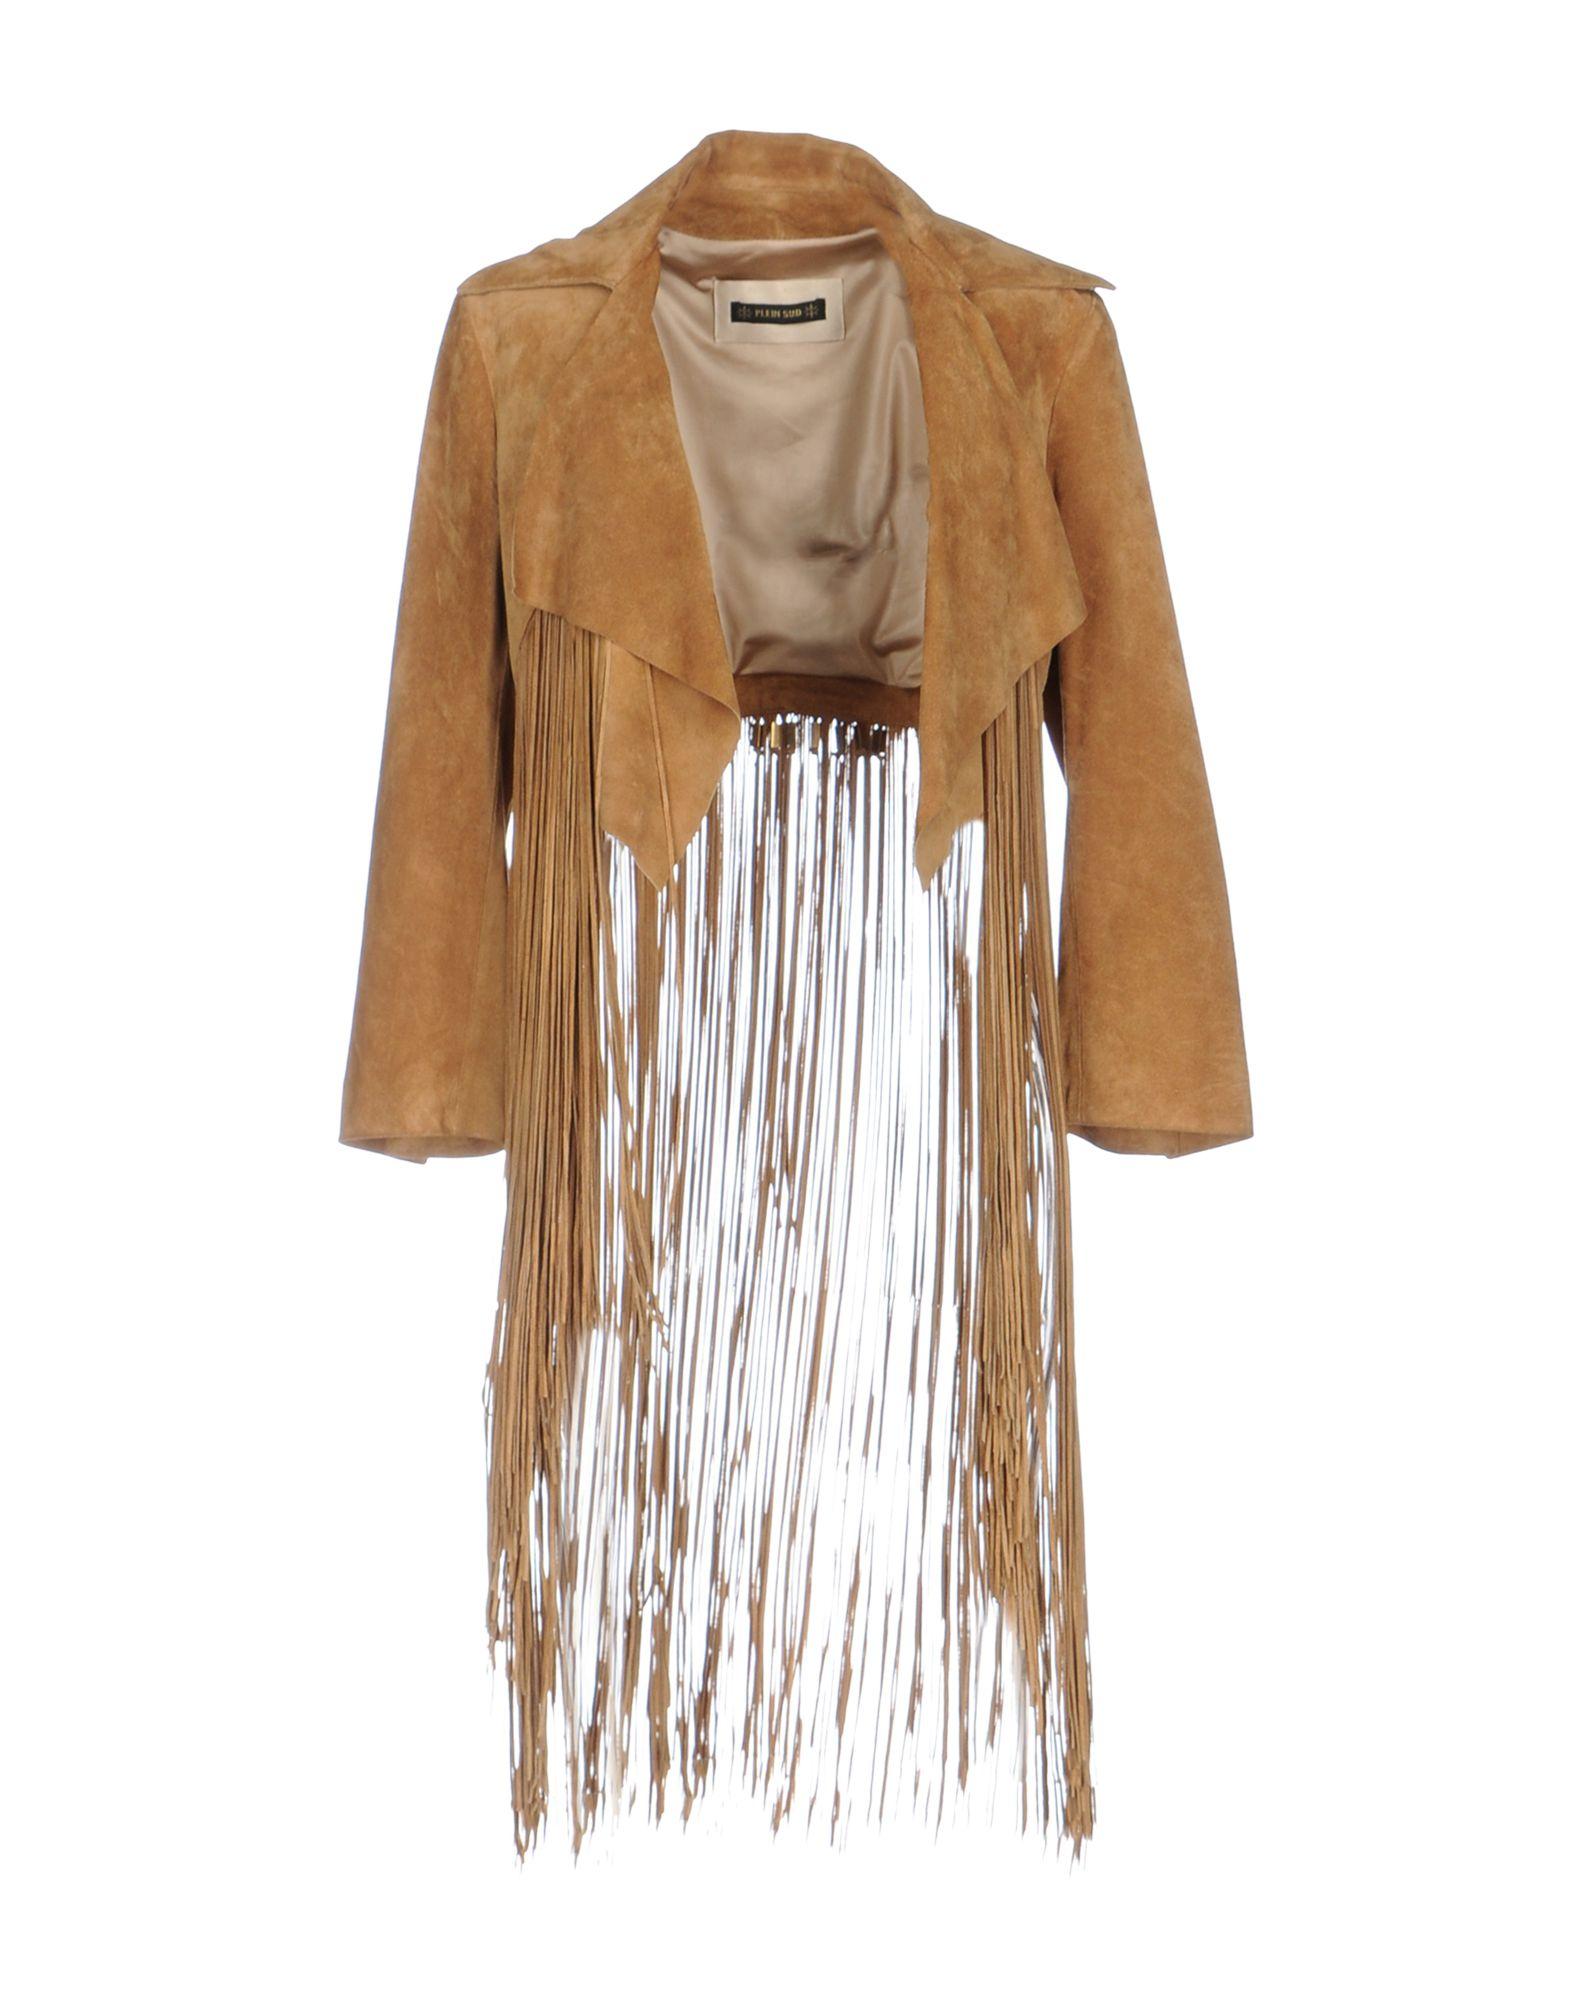 PLEIN SUD PAR FAYҪAL AMOR Damen Jackett Farbe Kamel Größe 6 jetztbilligerkaufen